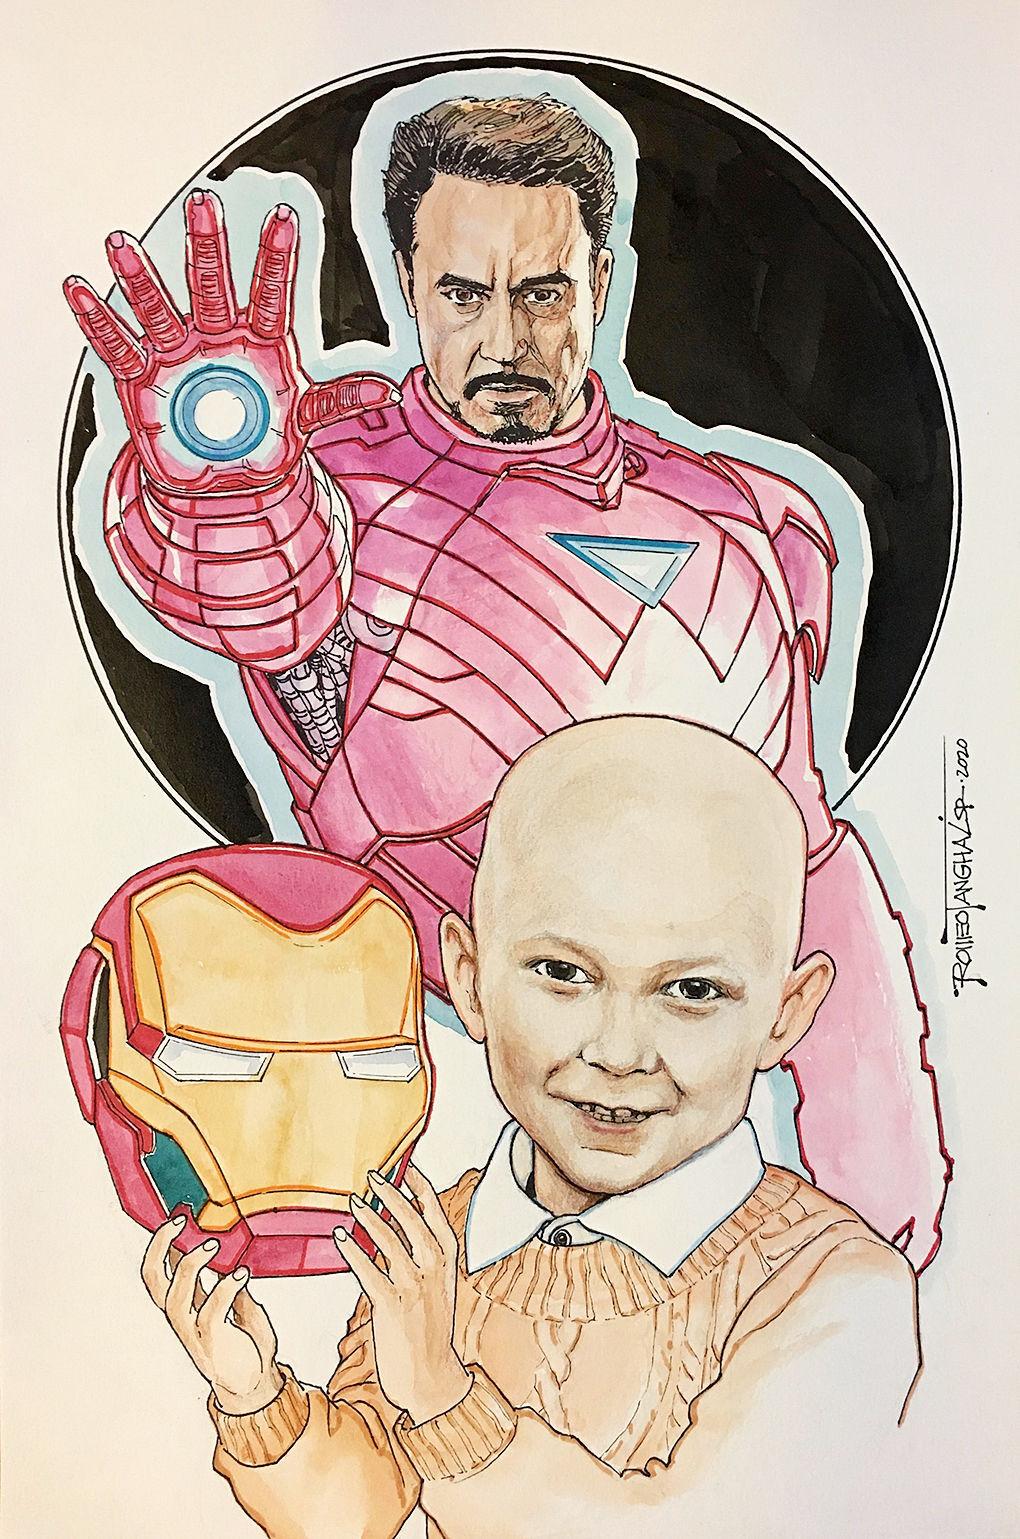 Meet 'Iron Boy': Hempfield Twp. boy fighting cancer is real superhero